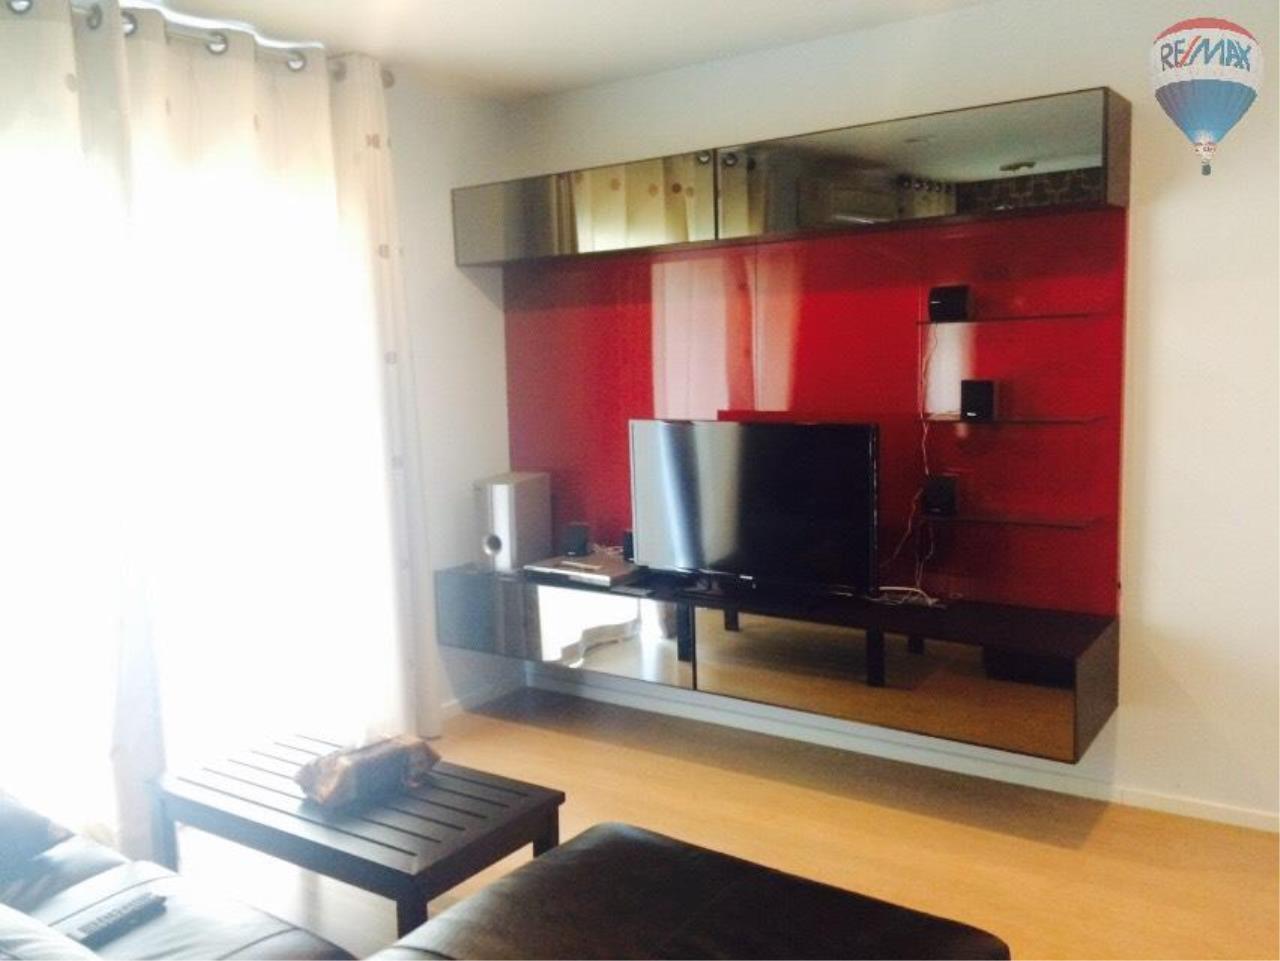 RE/MAX Properties Agency's Condominium for rent 2 bedrooms 92 Sq.m. at Renova Residence 16